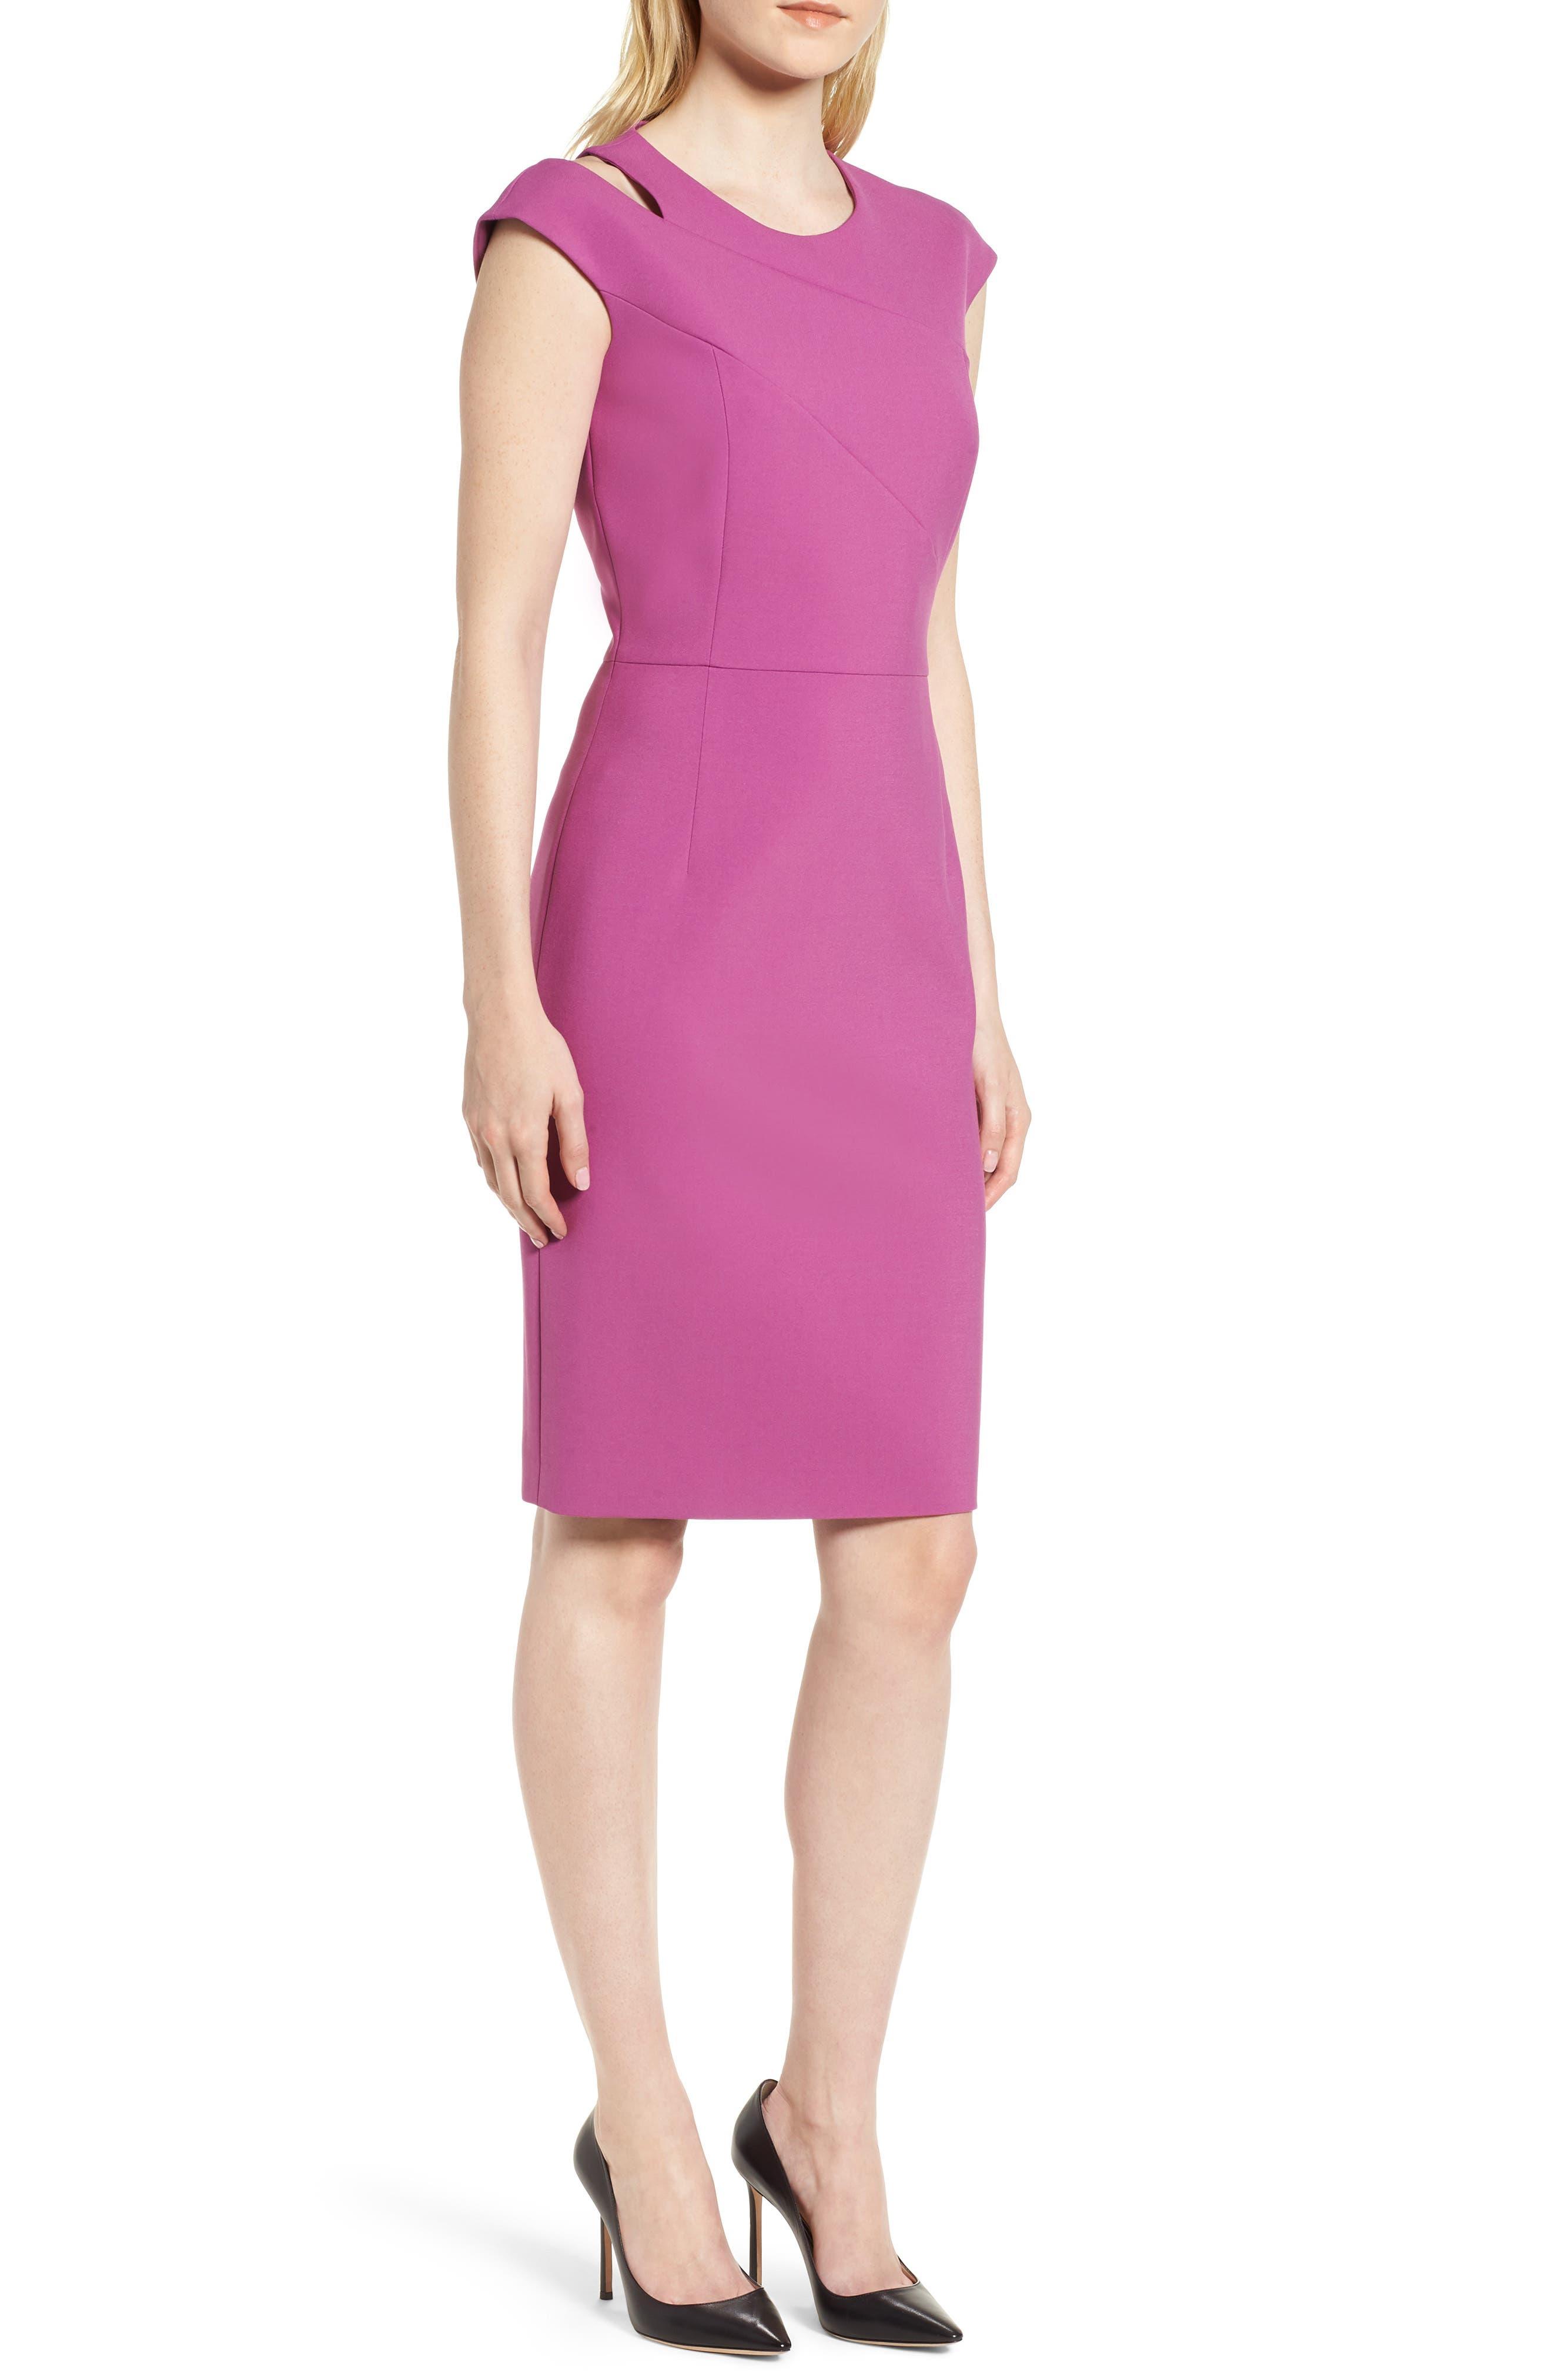 Danouk Ponte Sheath Dress,                             Main thumbnail 1, color,                             511